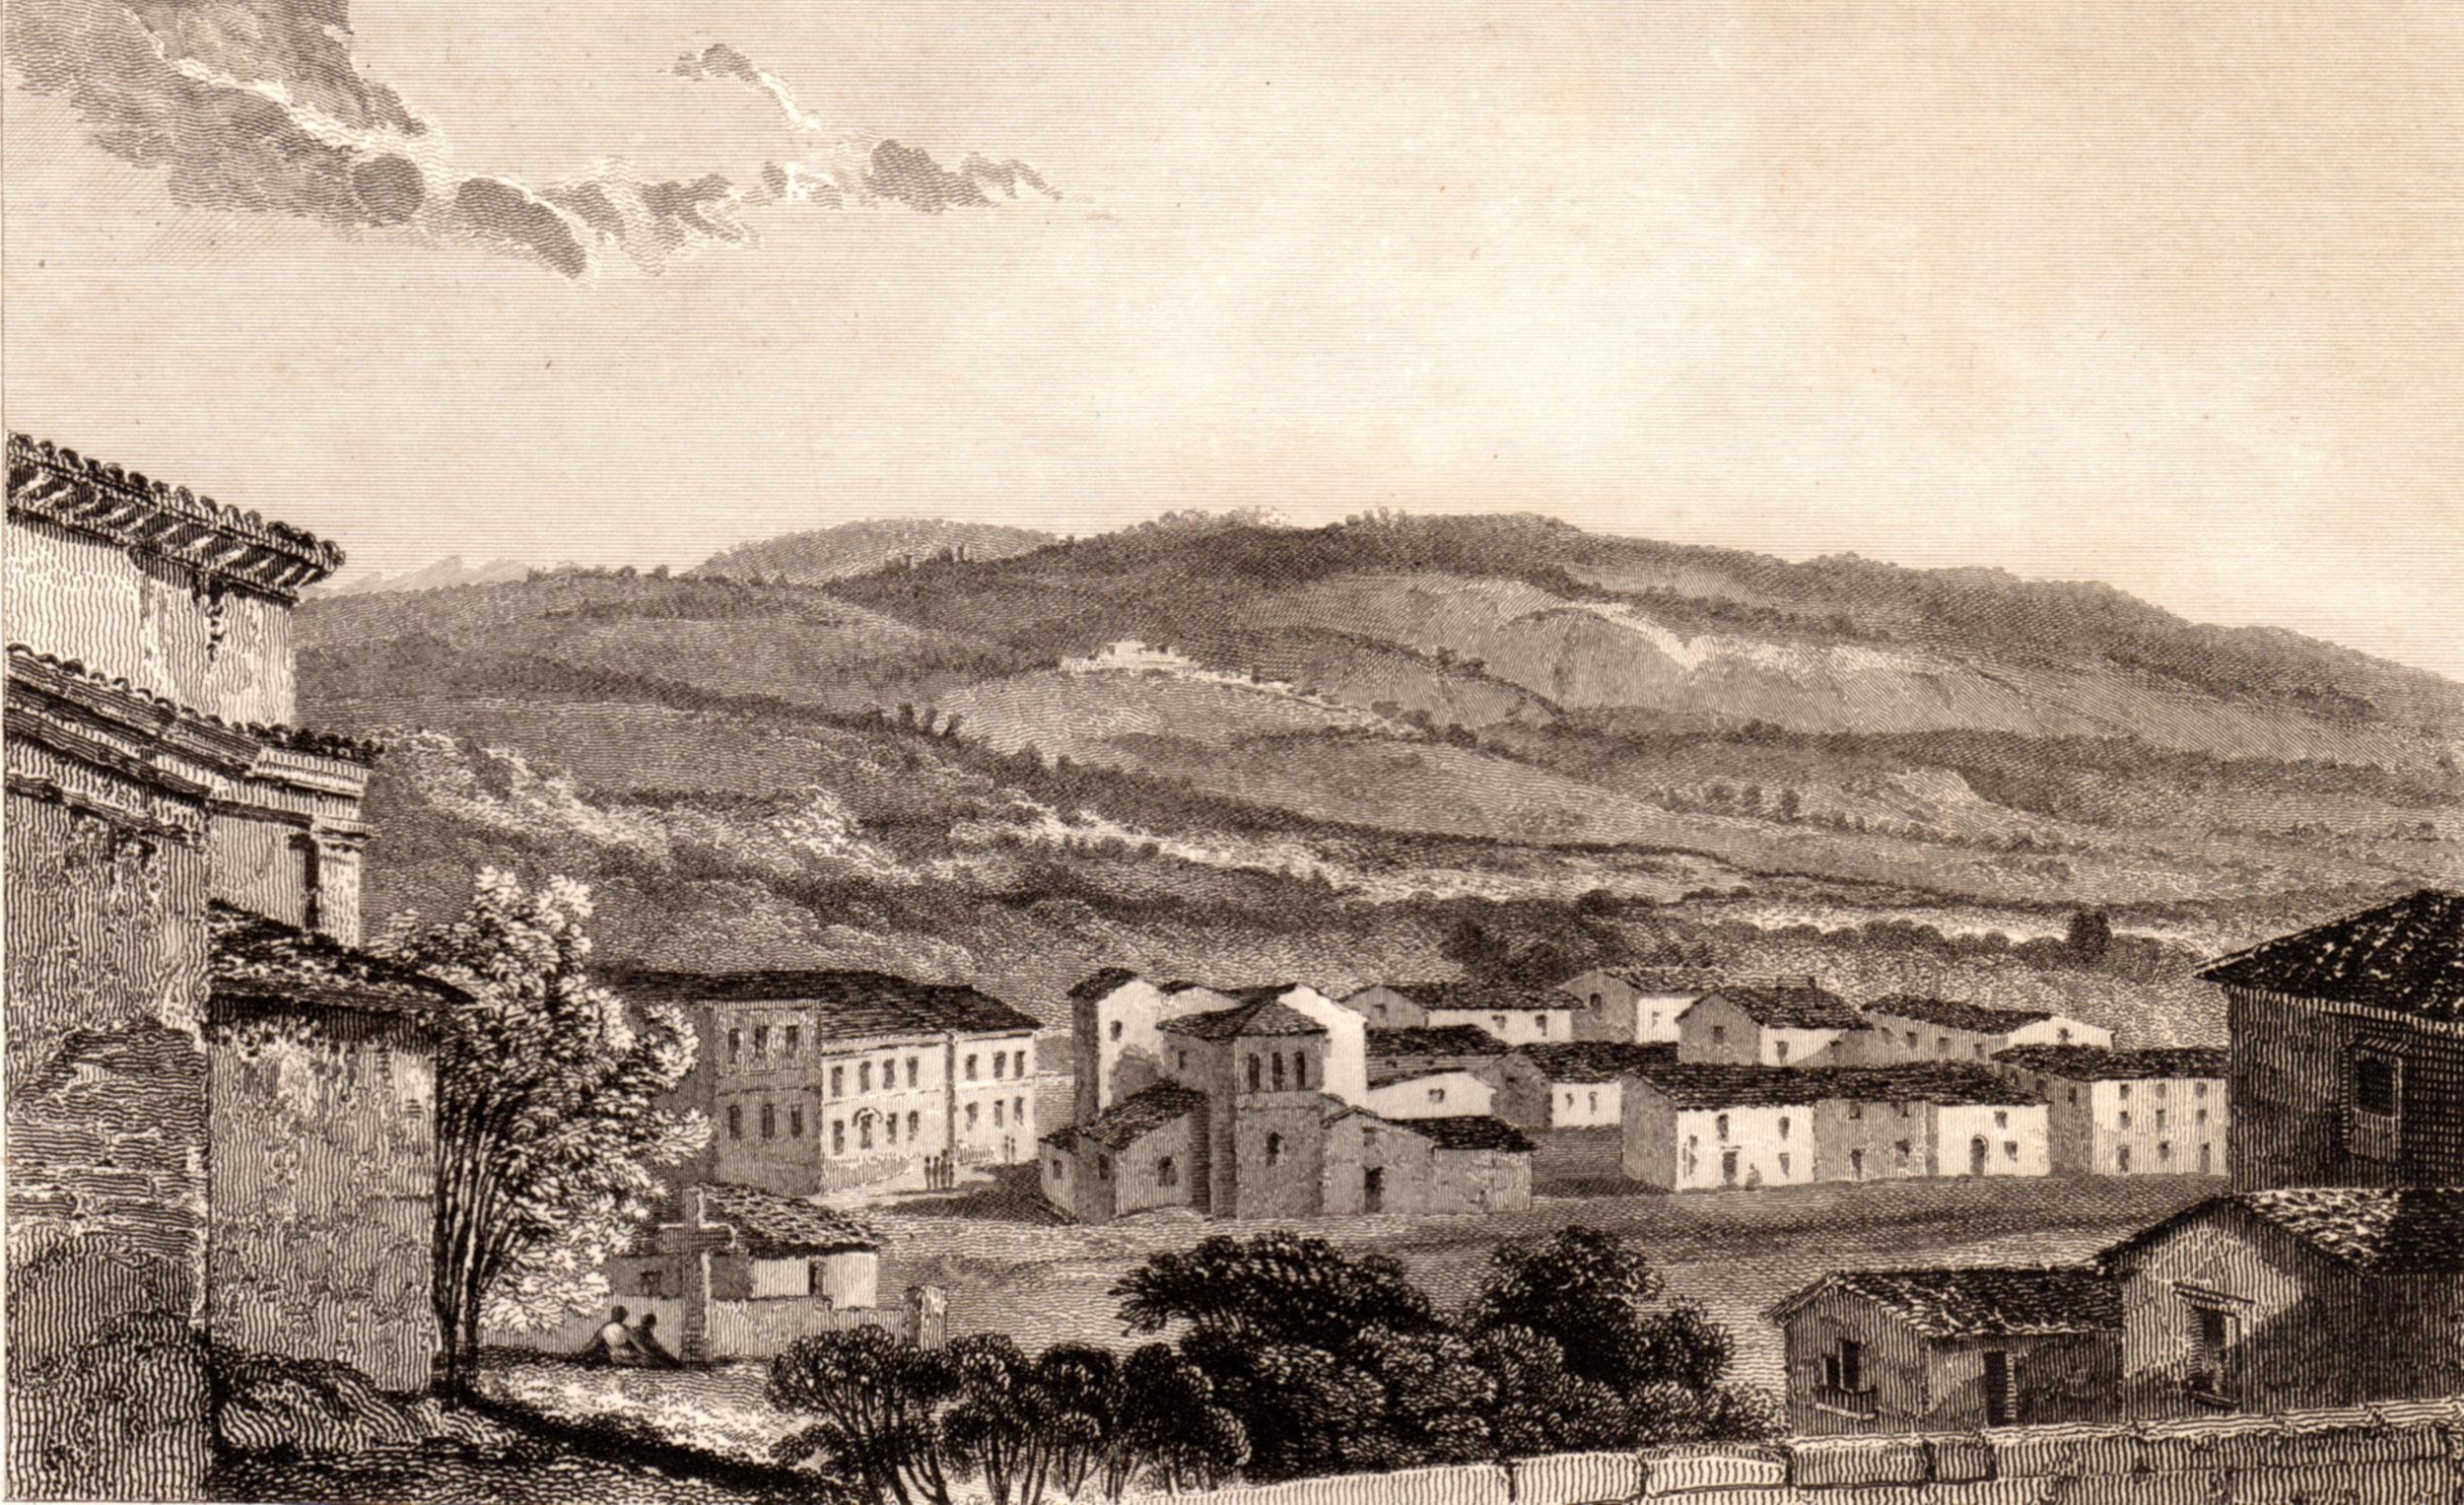 Craven, Richard Keppel / Kingdom of Naples